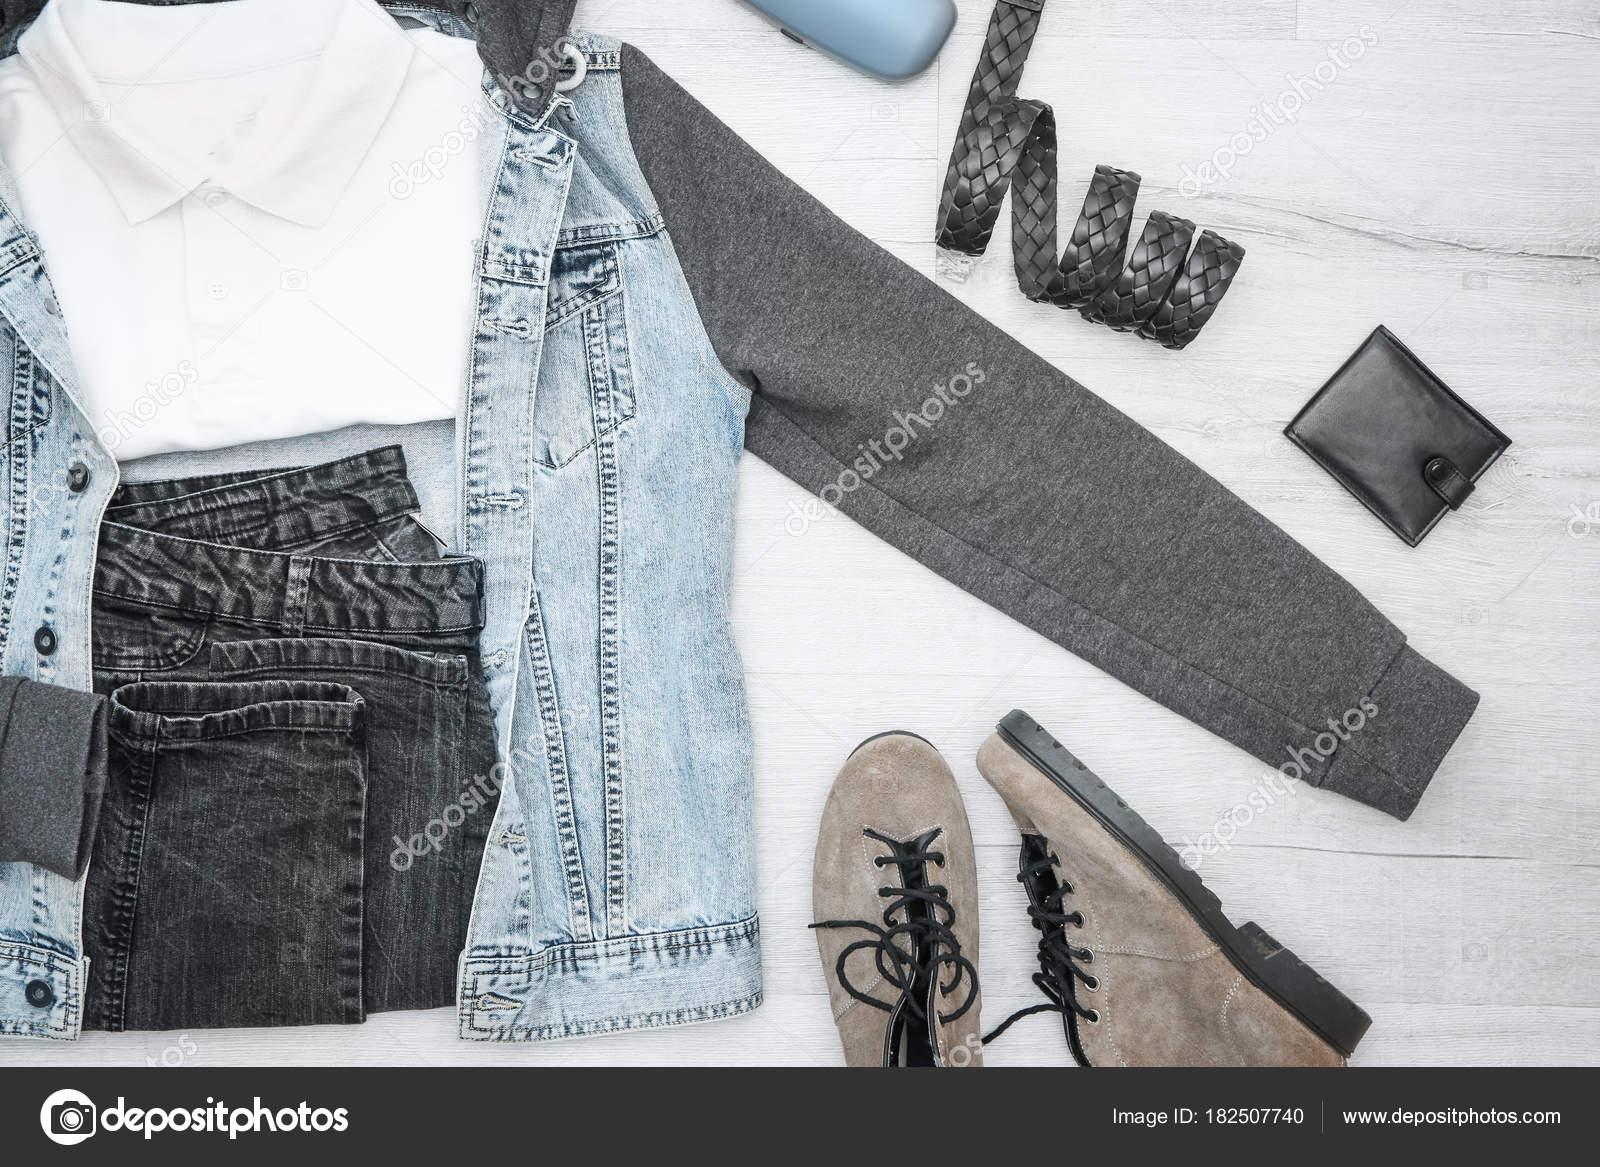 06ffdacaf3 Μοντέρνα ανδρική hipster ρούχα σε φόντο ξύλινη — Φωτογραφία Αρχείου ...